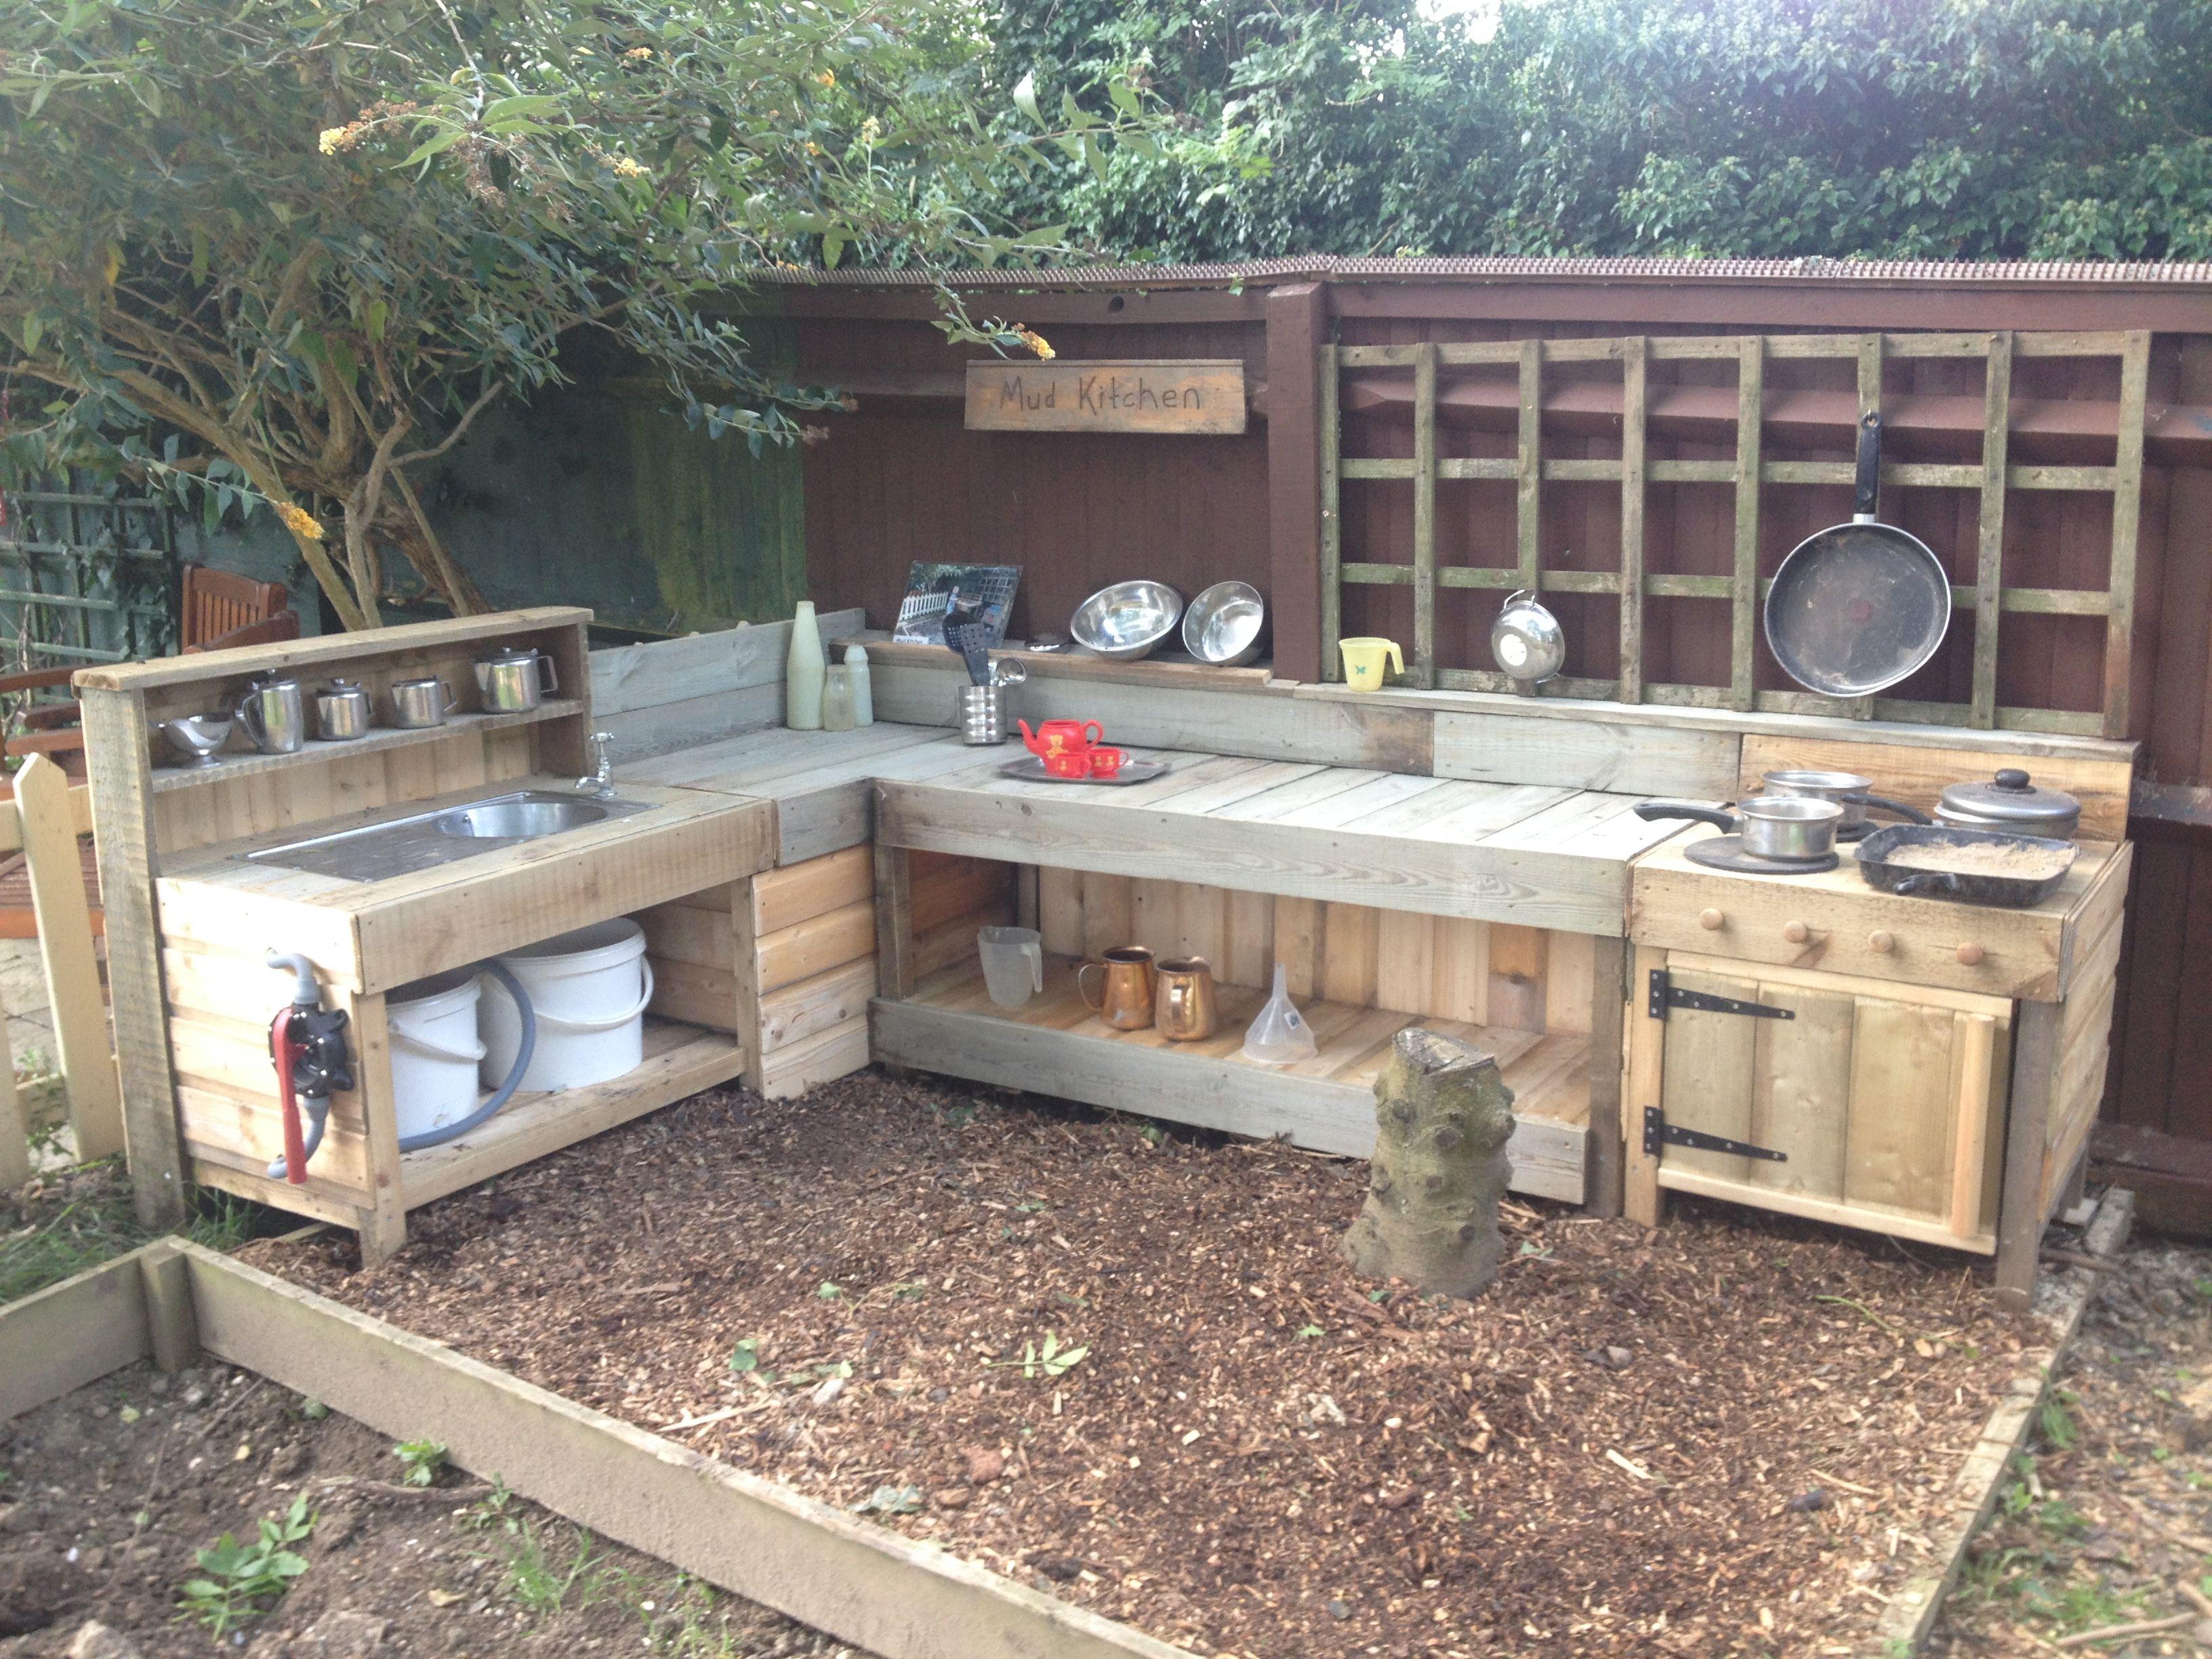 Our New Mud Kitchen Mudkitchen Openendedplay Mud Mud Kitchen Gardening For Kids Mud Kitchen For Kids